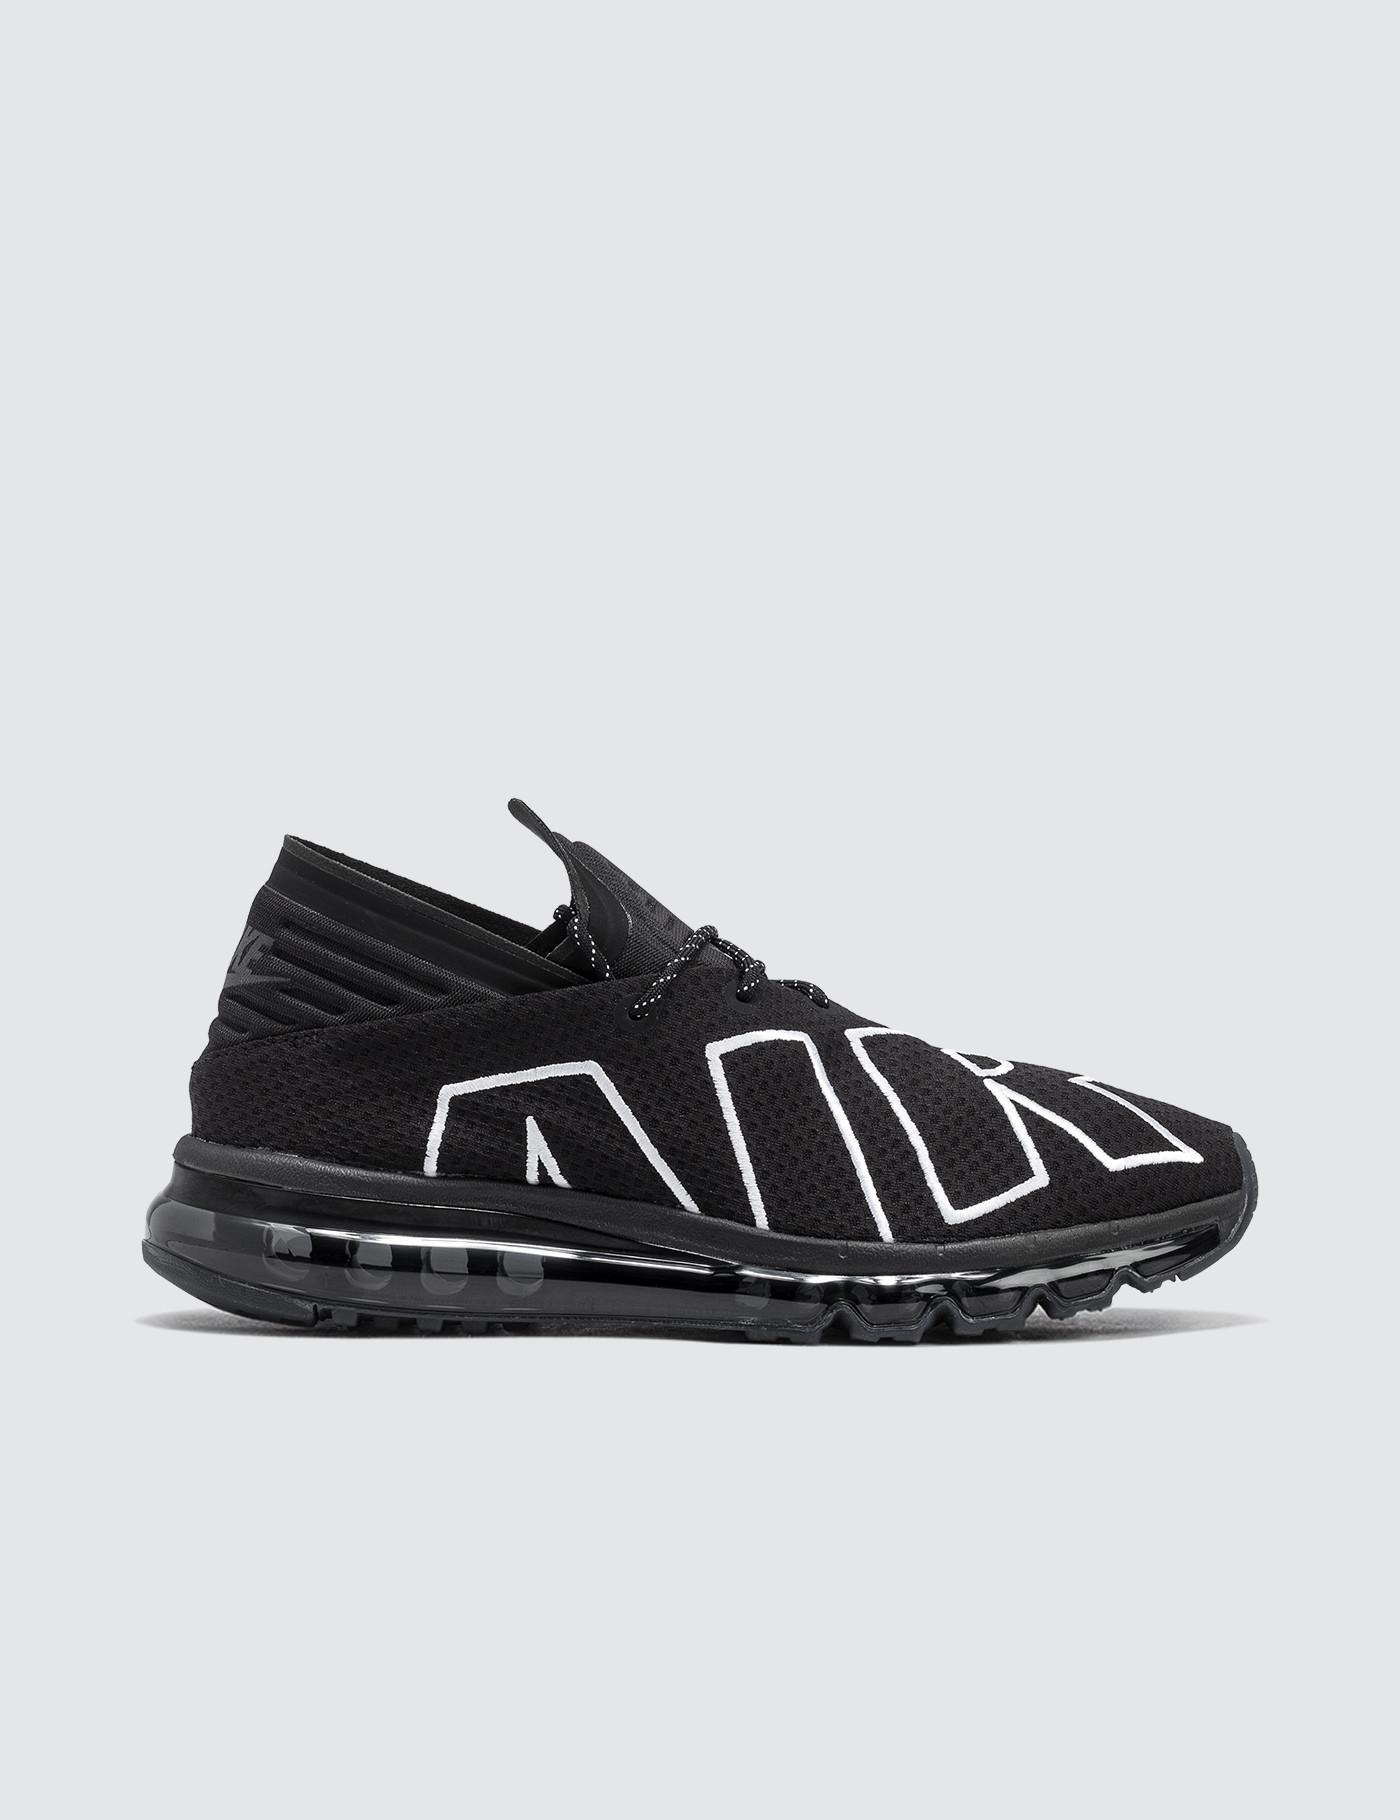 Lyst - Nike Air Max Flair in Black for Men be040c879